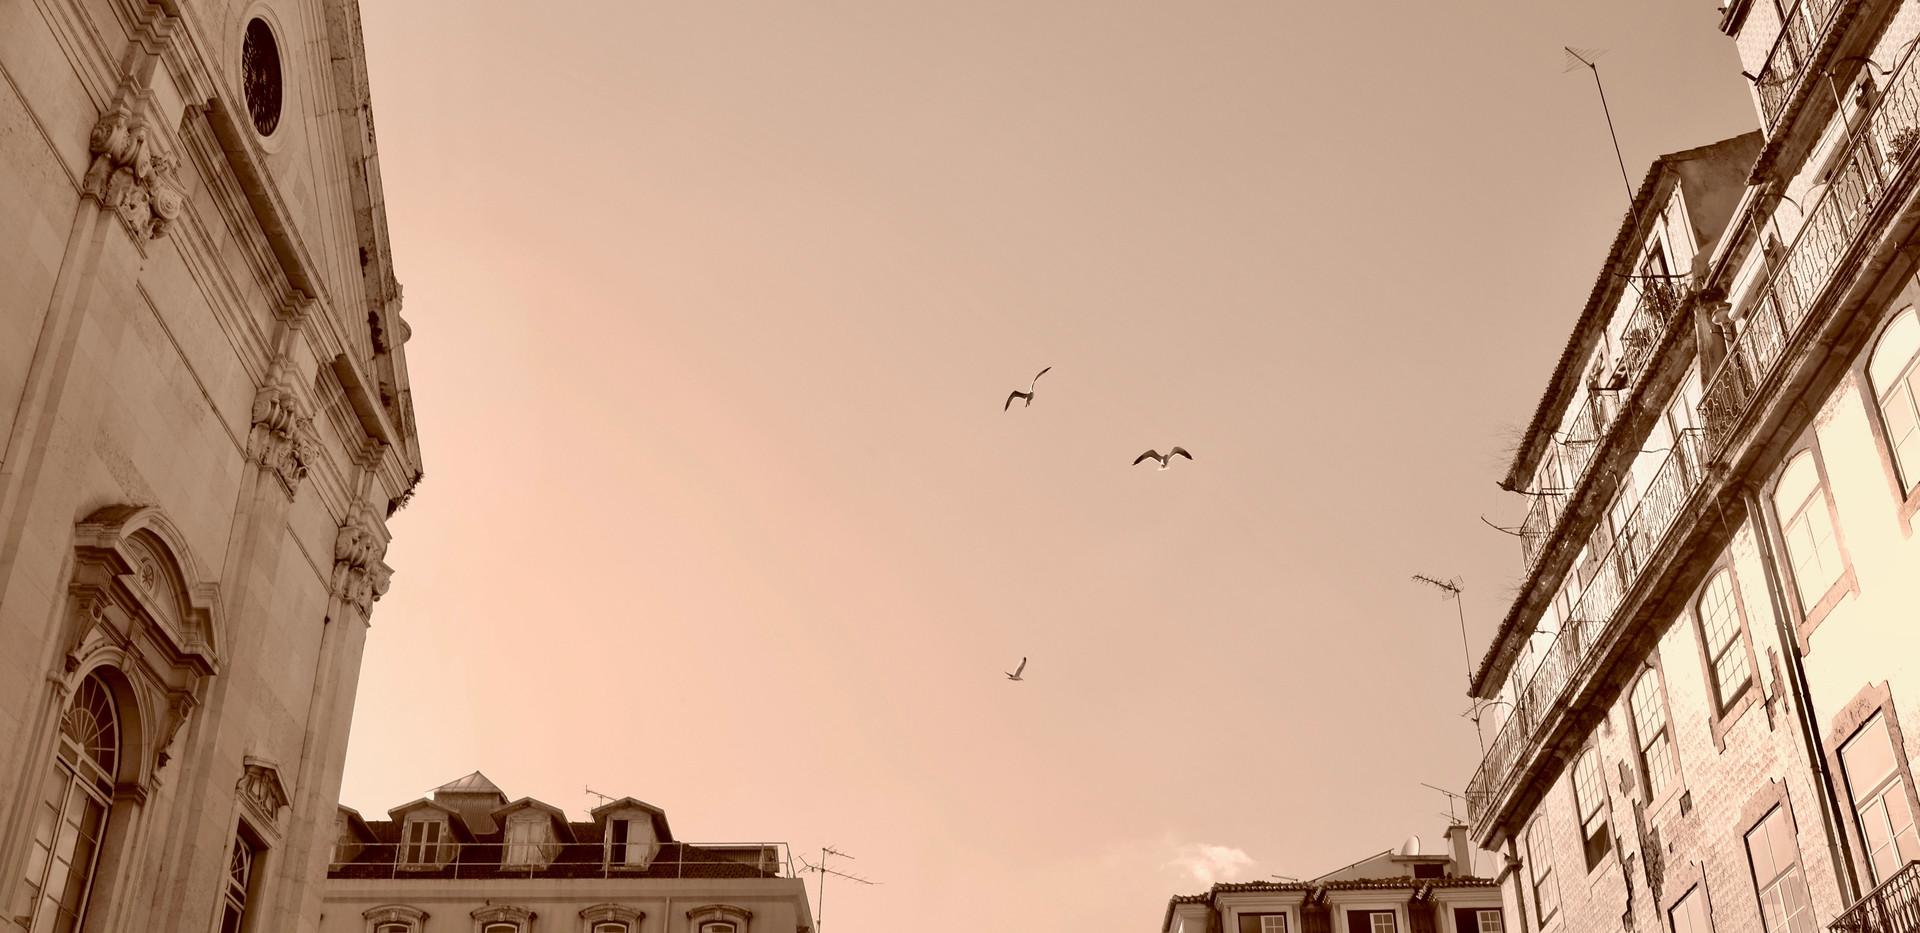 lisboa flight